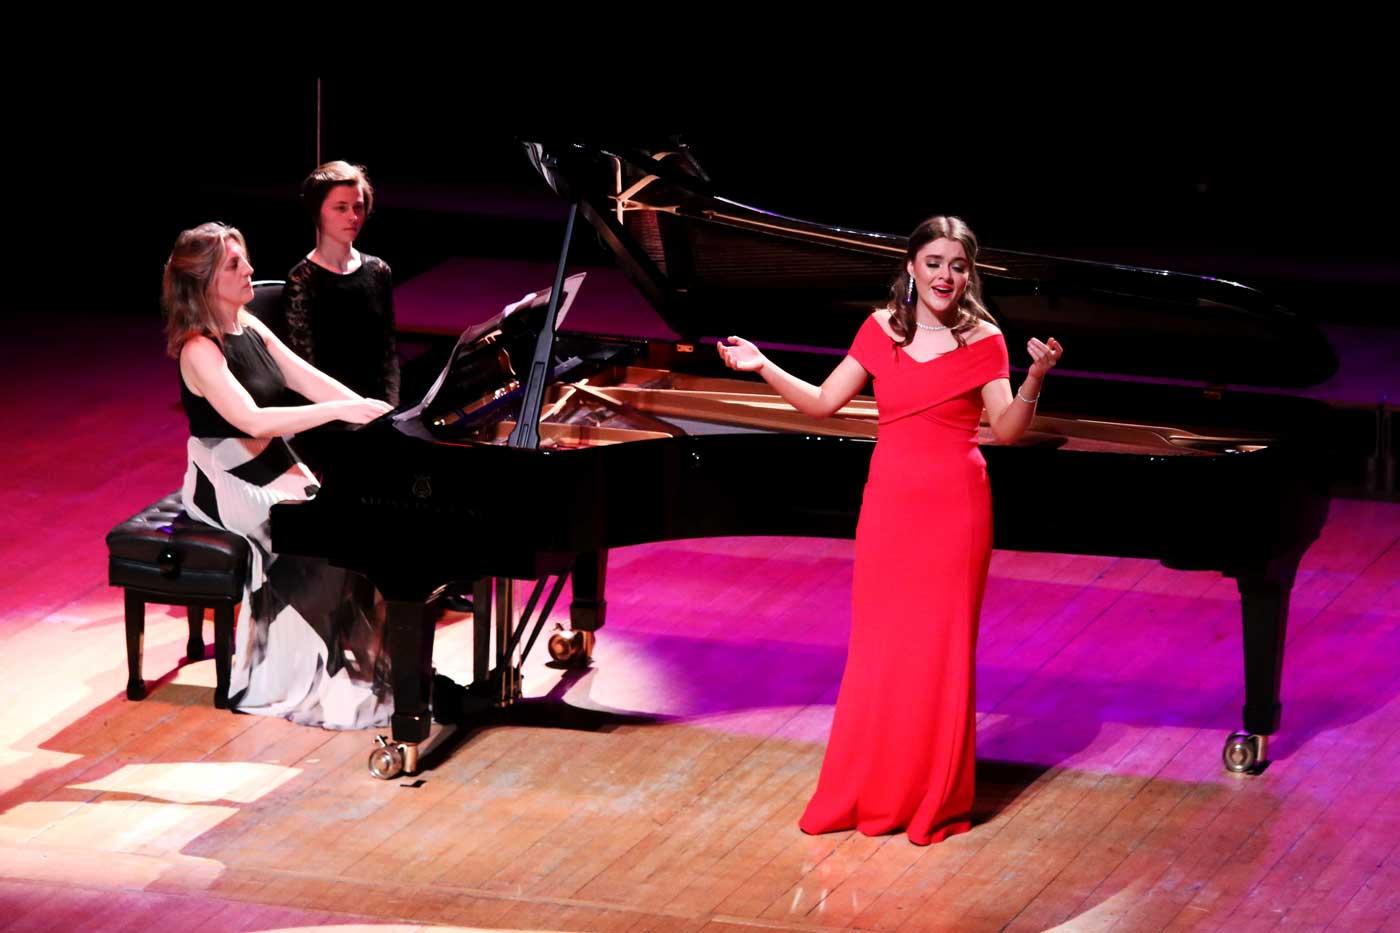 Feis Ceoil Concert Gala 2019, Ava Dodd – Photo by Frances Marshall